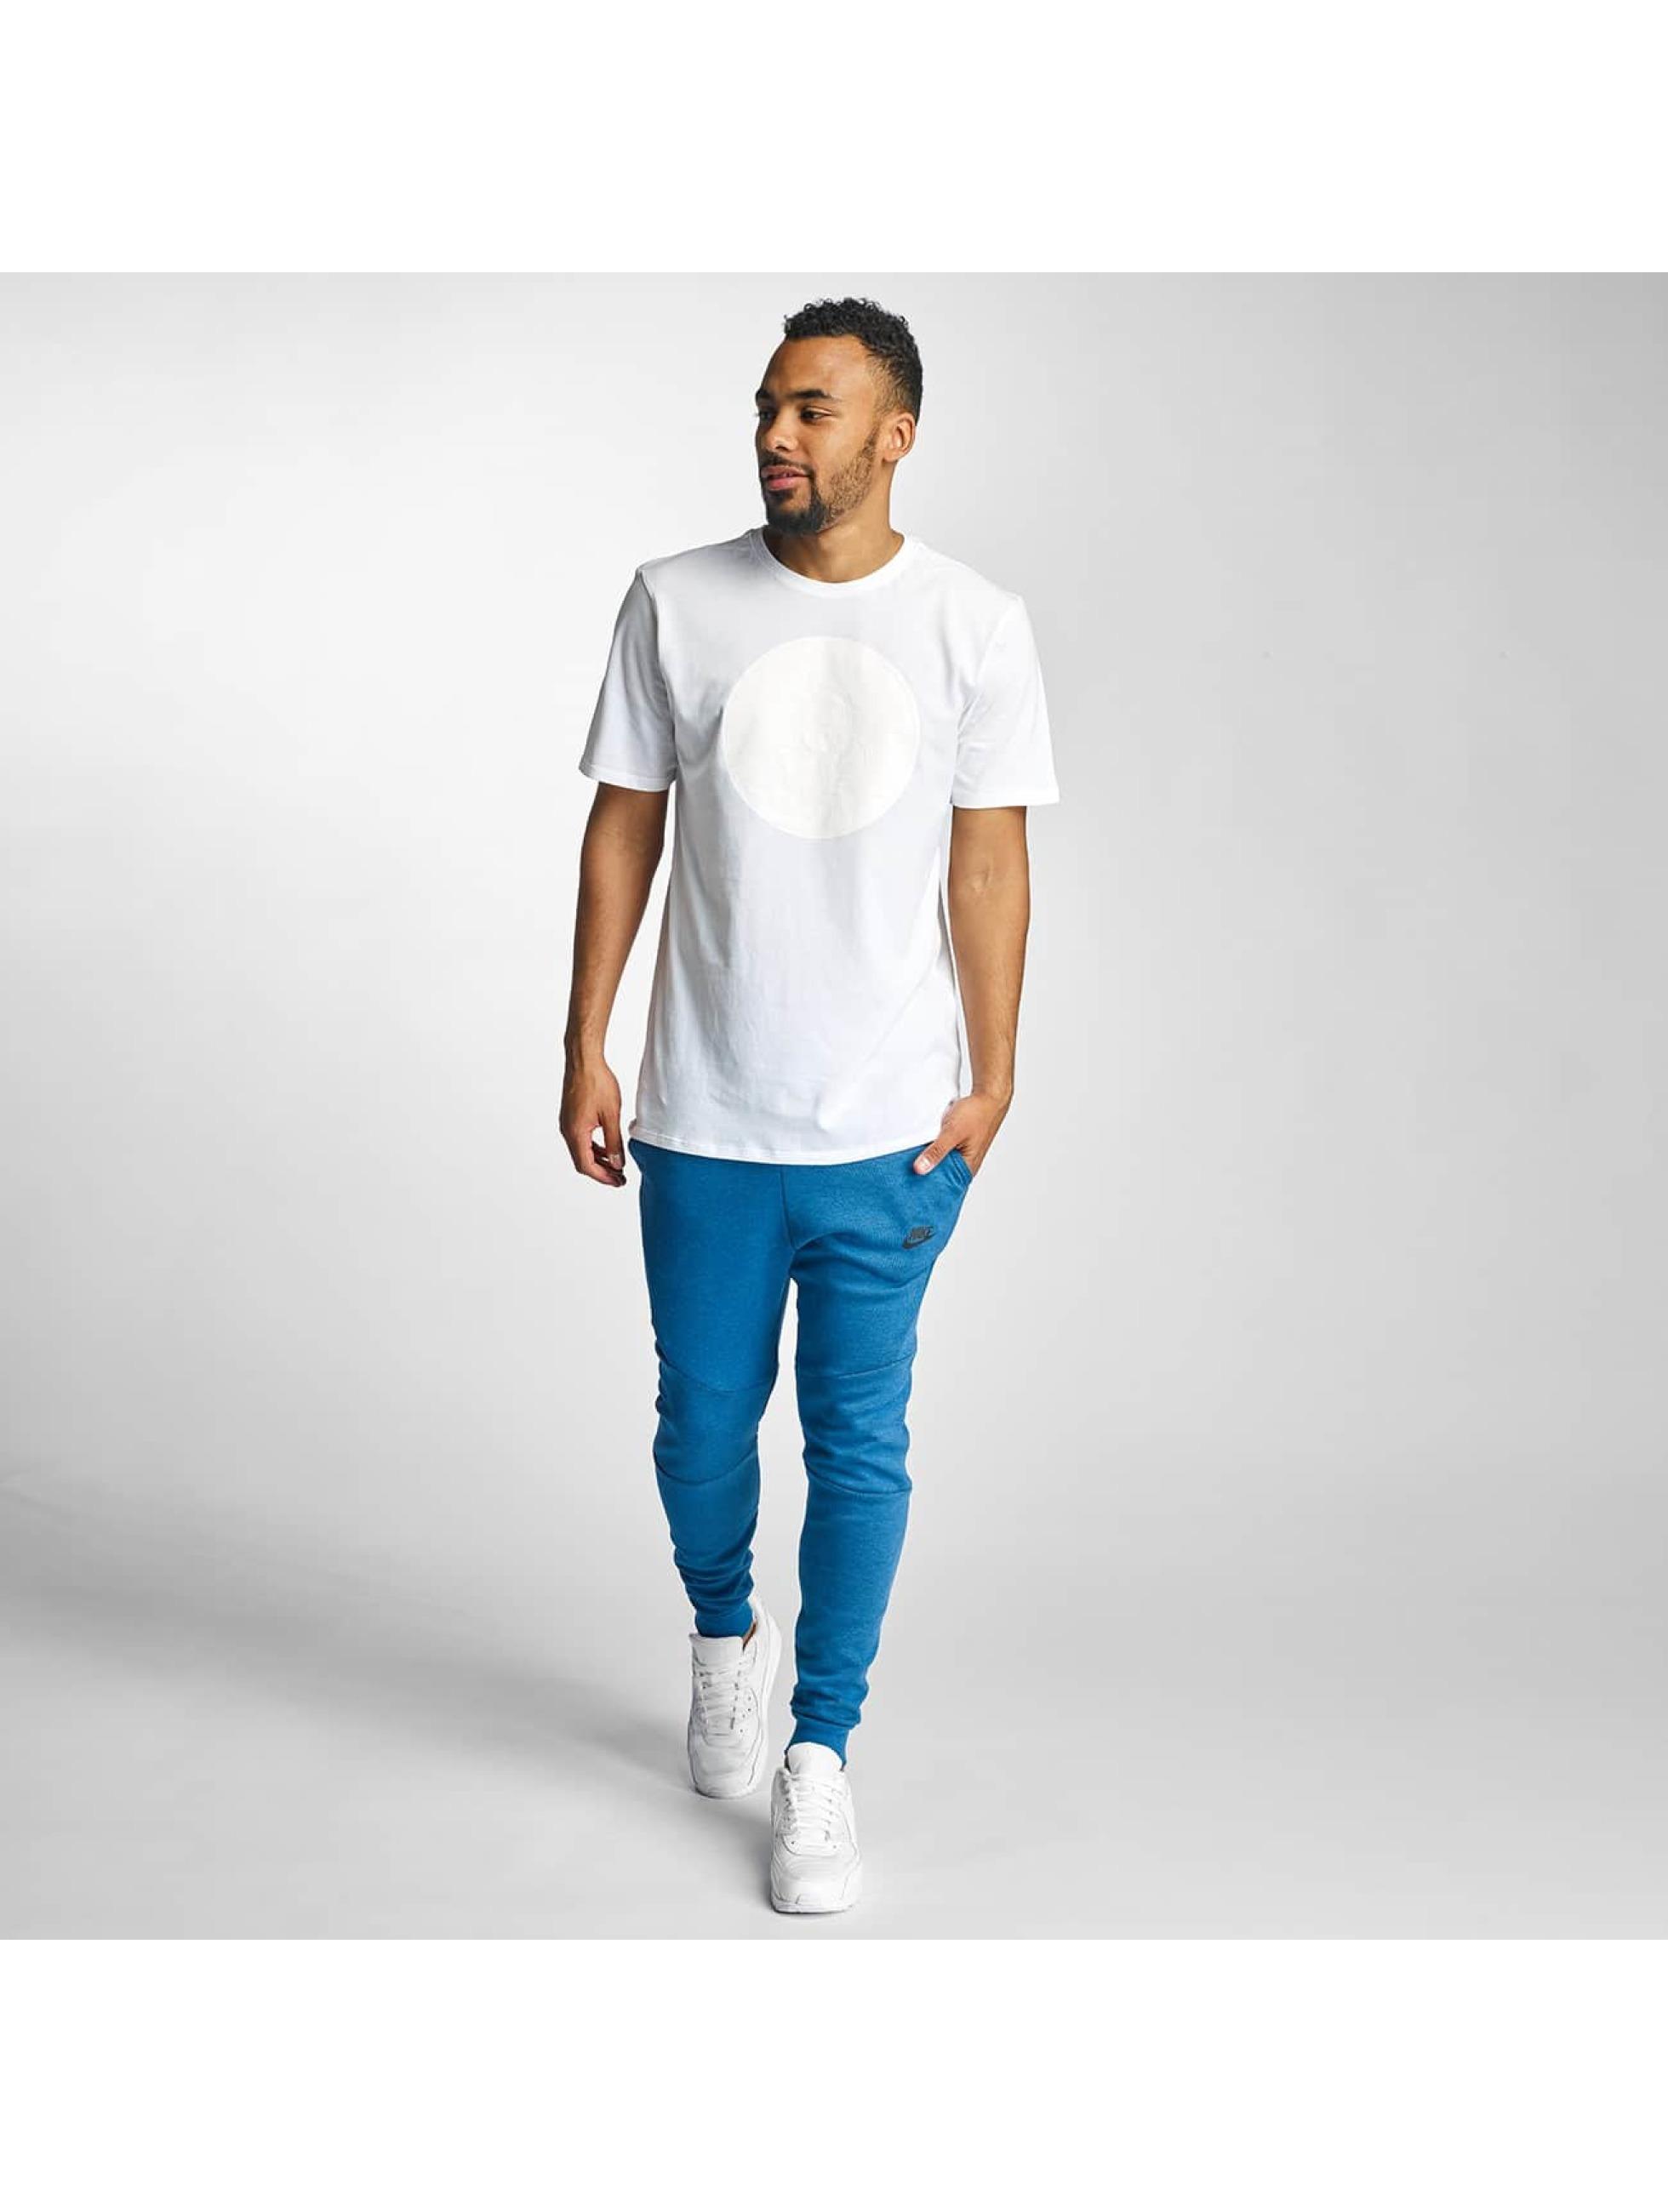 Nike tepláky Sportswear Tech Fleece modrá